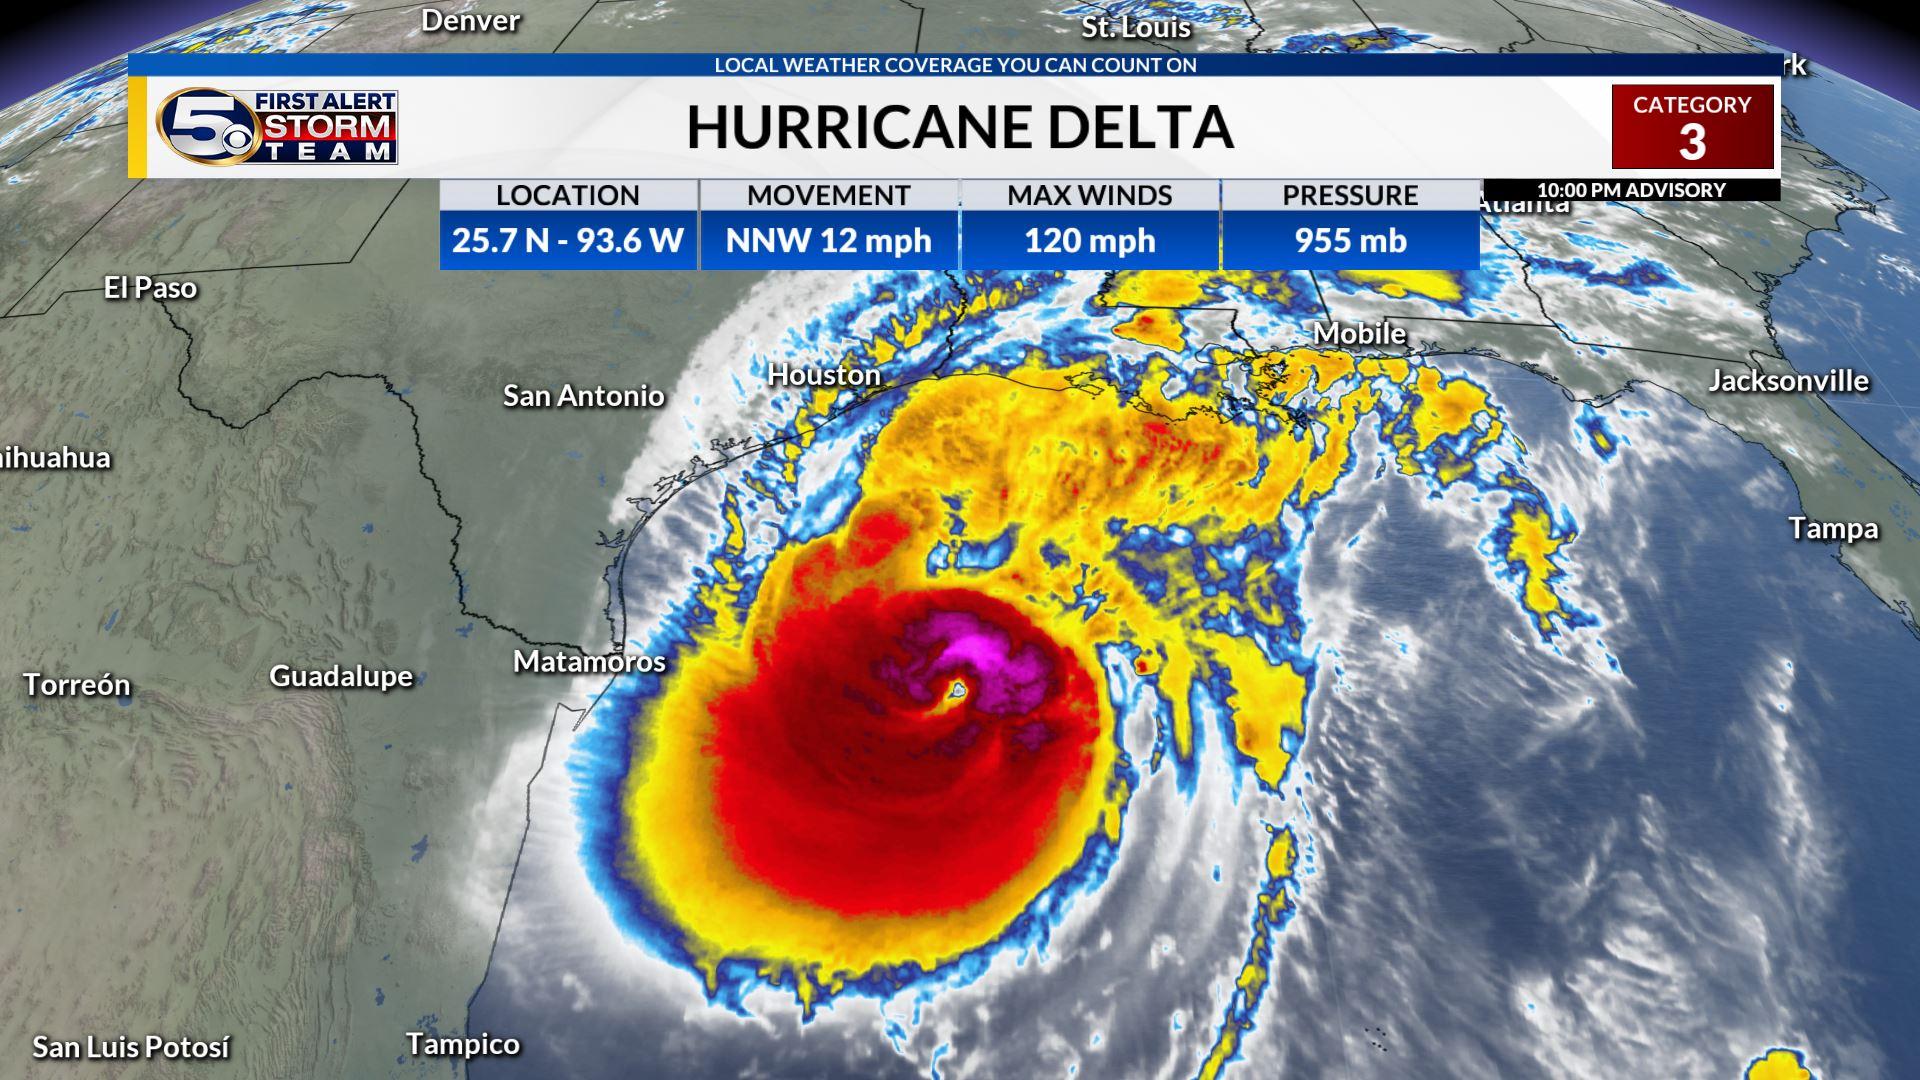 Major Hurricane Delta Forecast to Make Landfall Friday